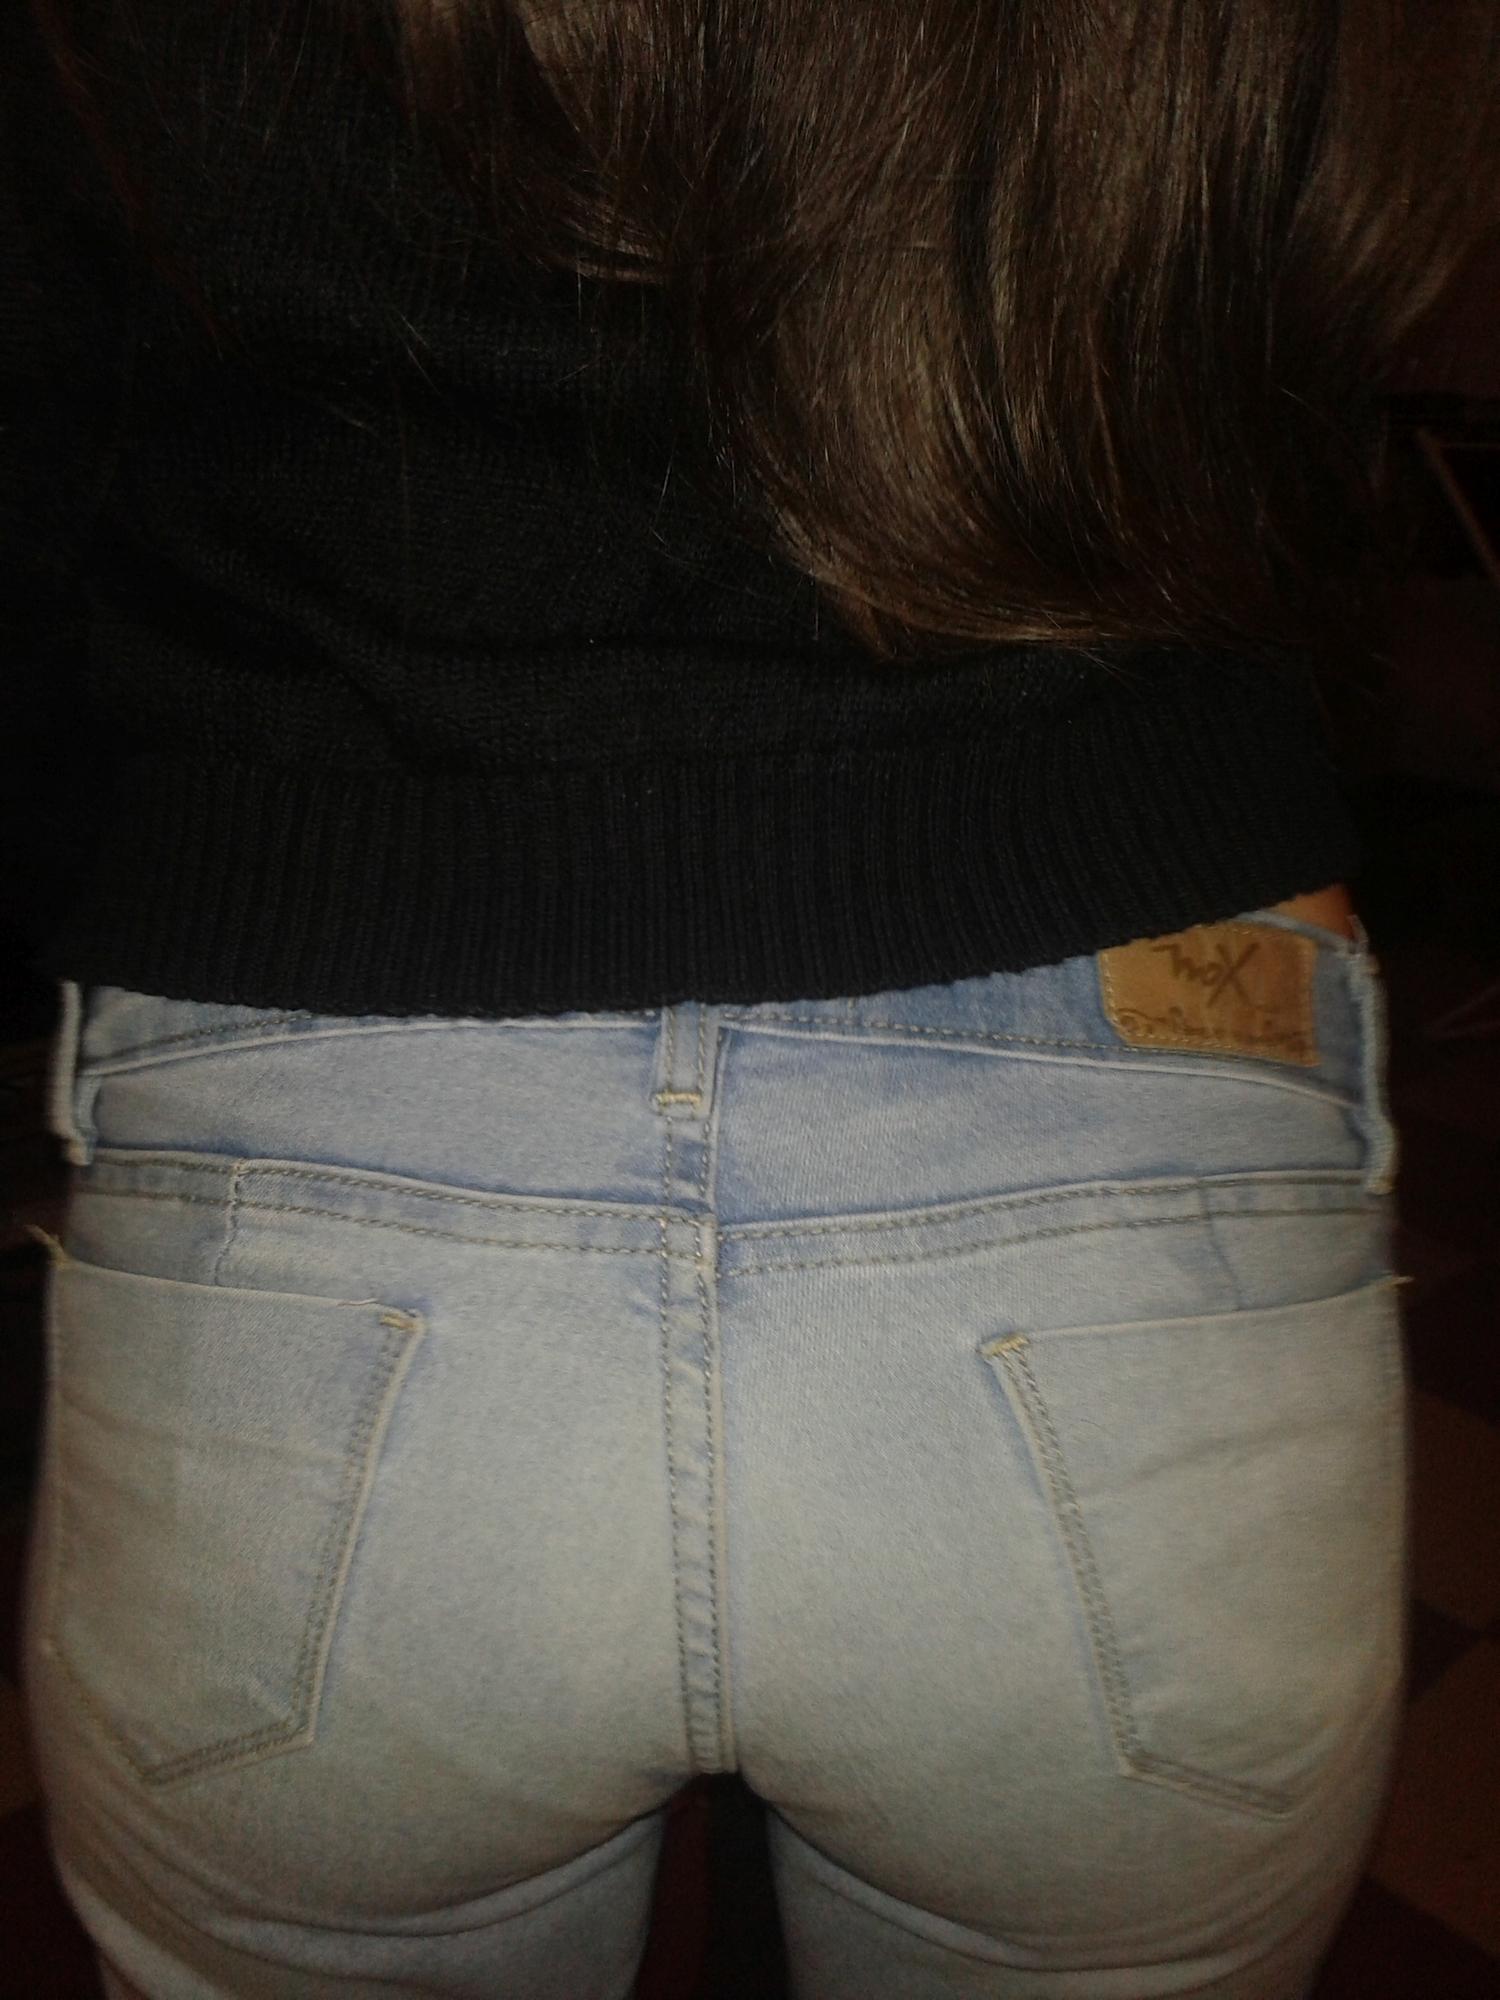 19-летняя брюнетка обнажается в домашних условиях 12 фото